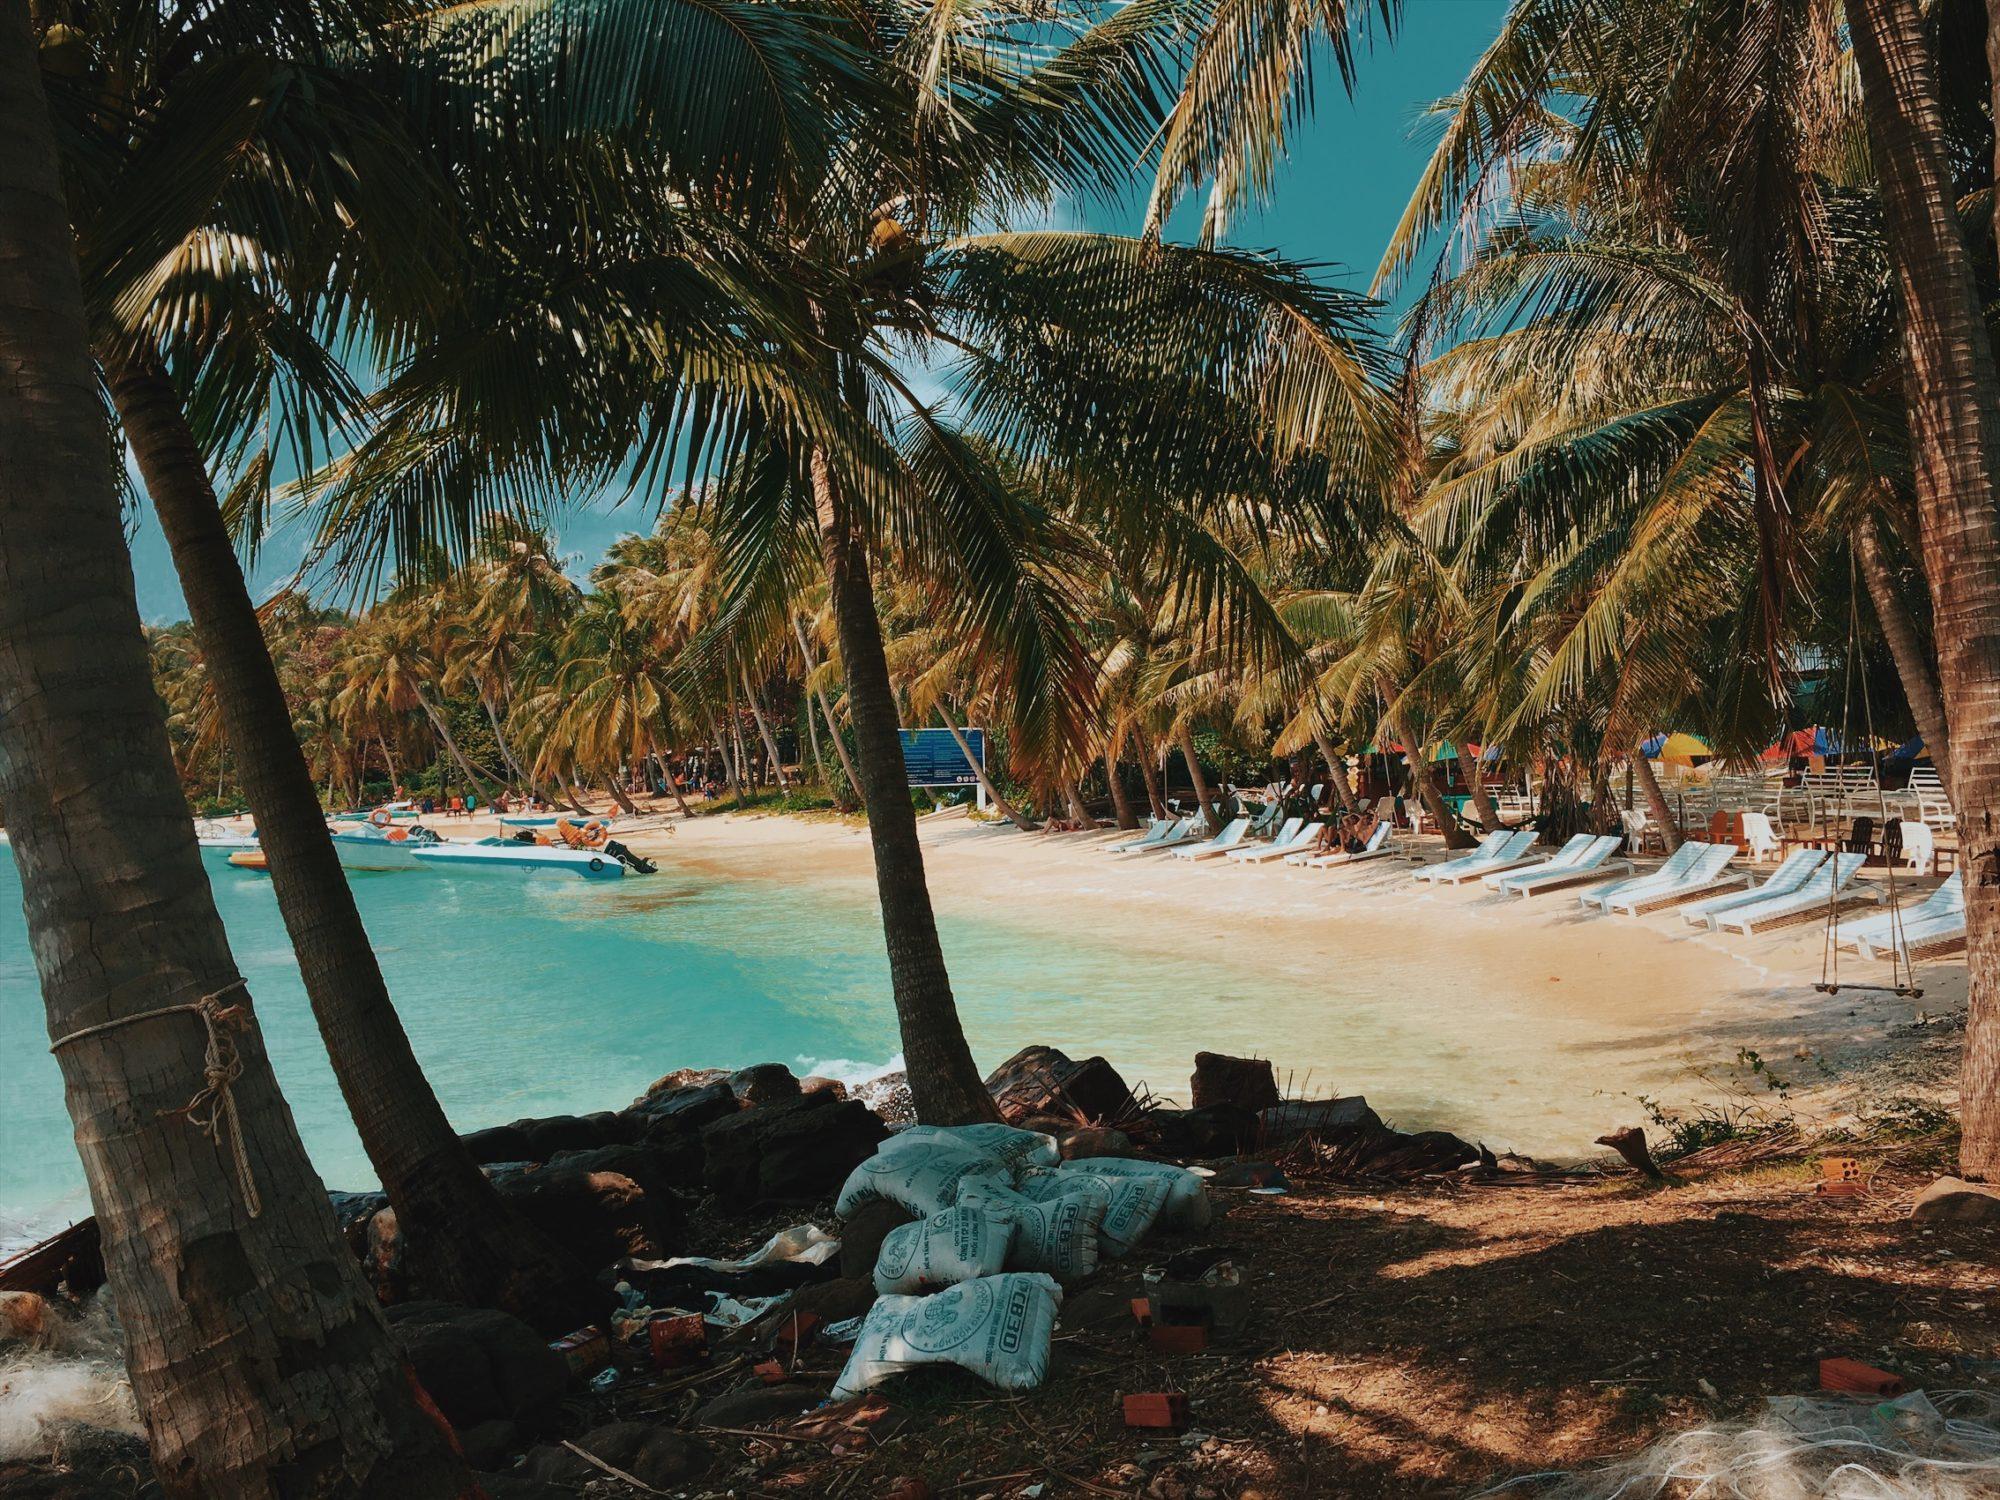 rajska plaża an thoi plaze w wietnamie neverendingtravel.pl